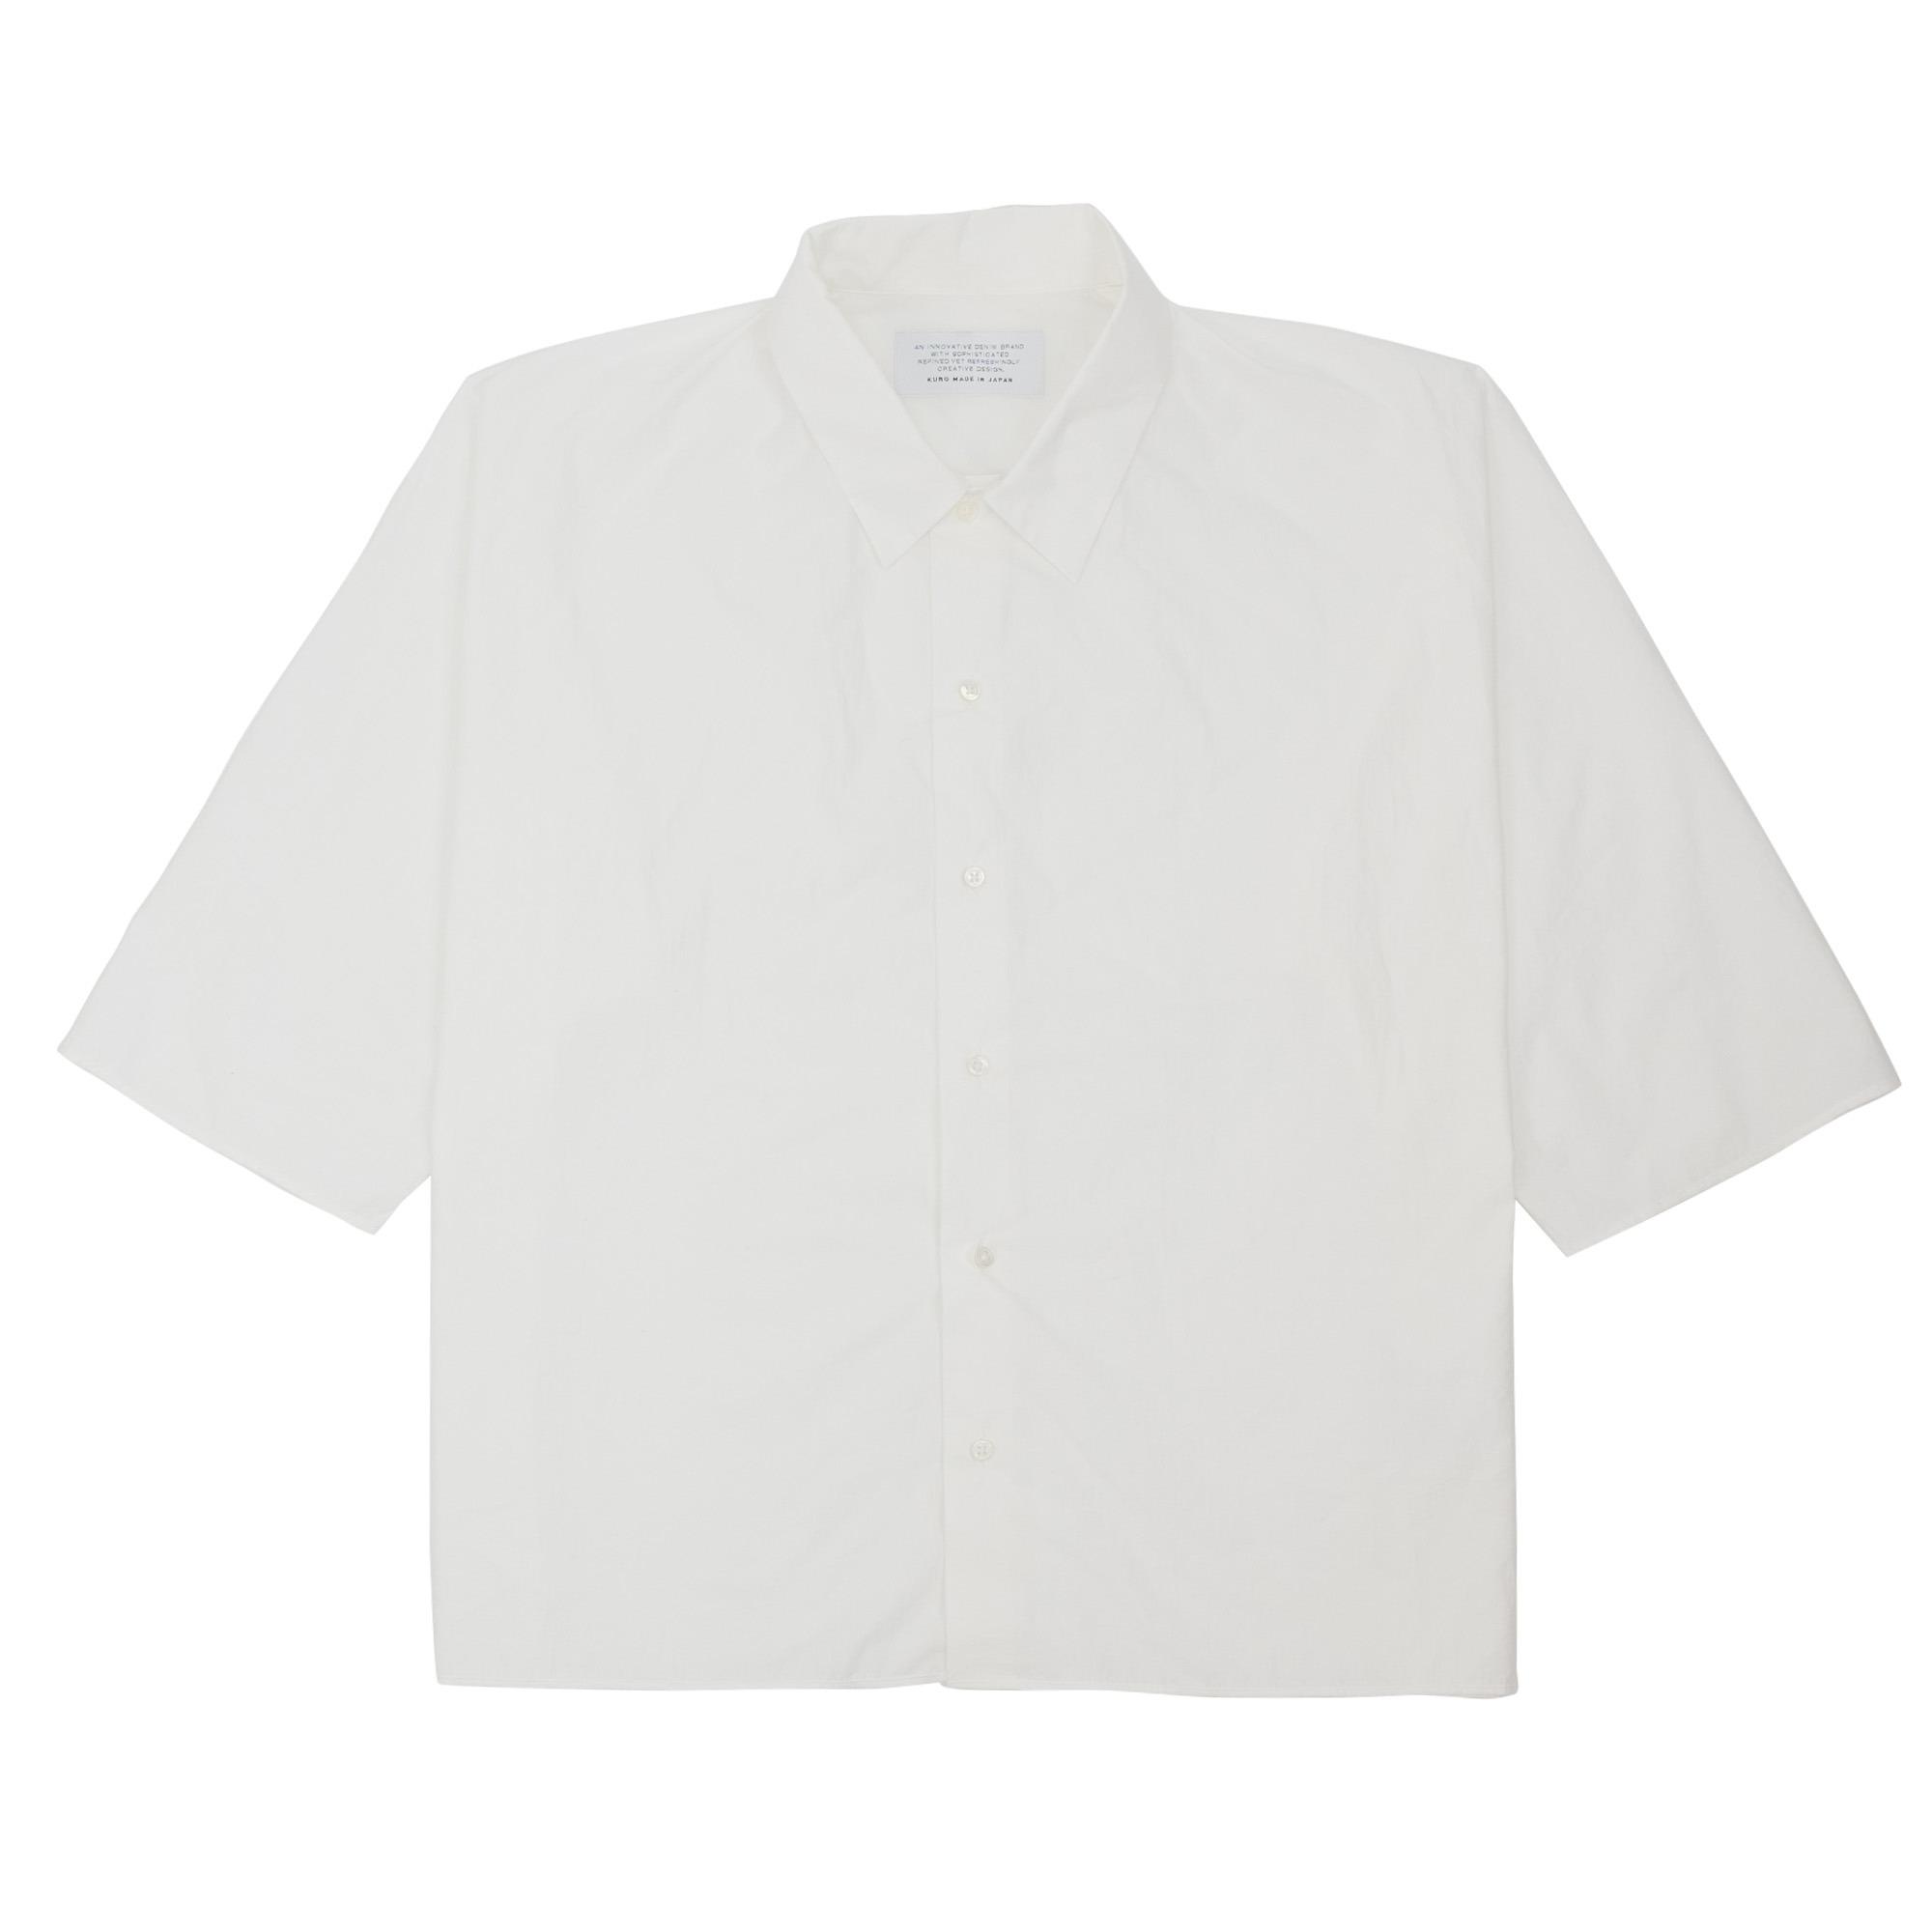 Dolman Sleeve S-S Shirt Off White 1